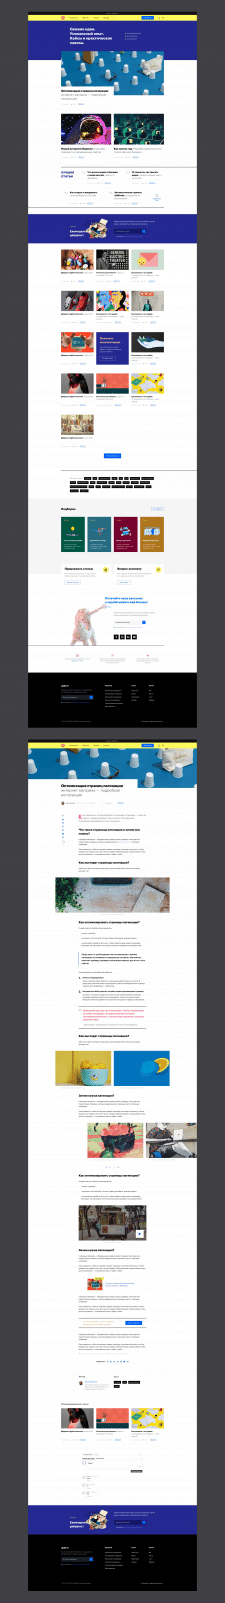 Spectr Blog – дизайн блога digital-агентства